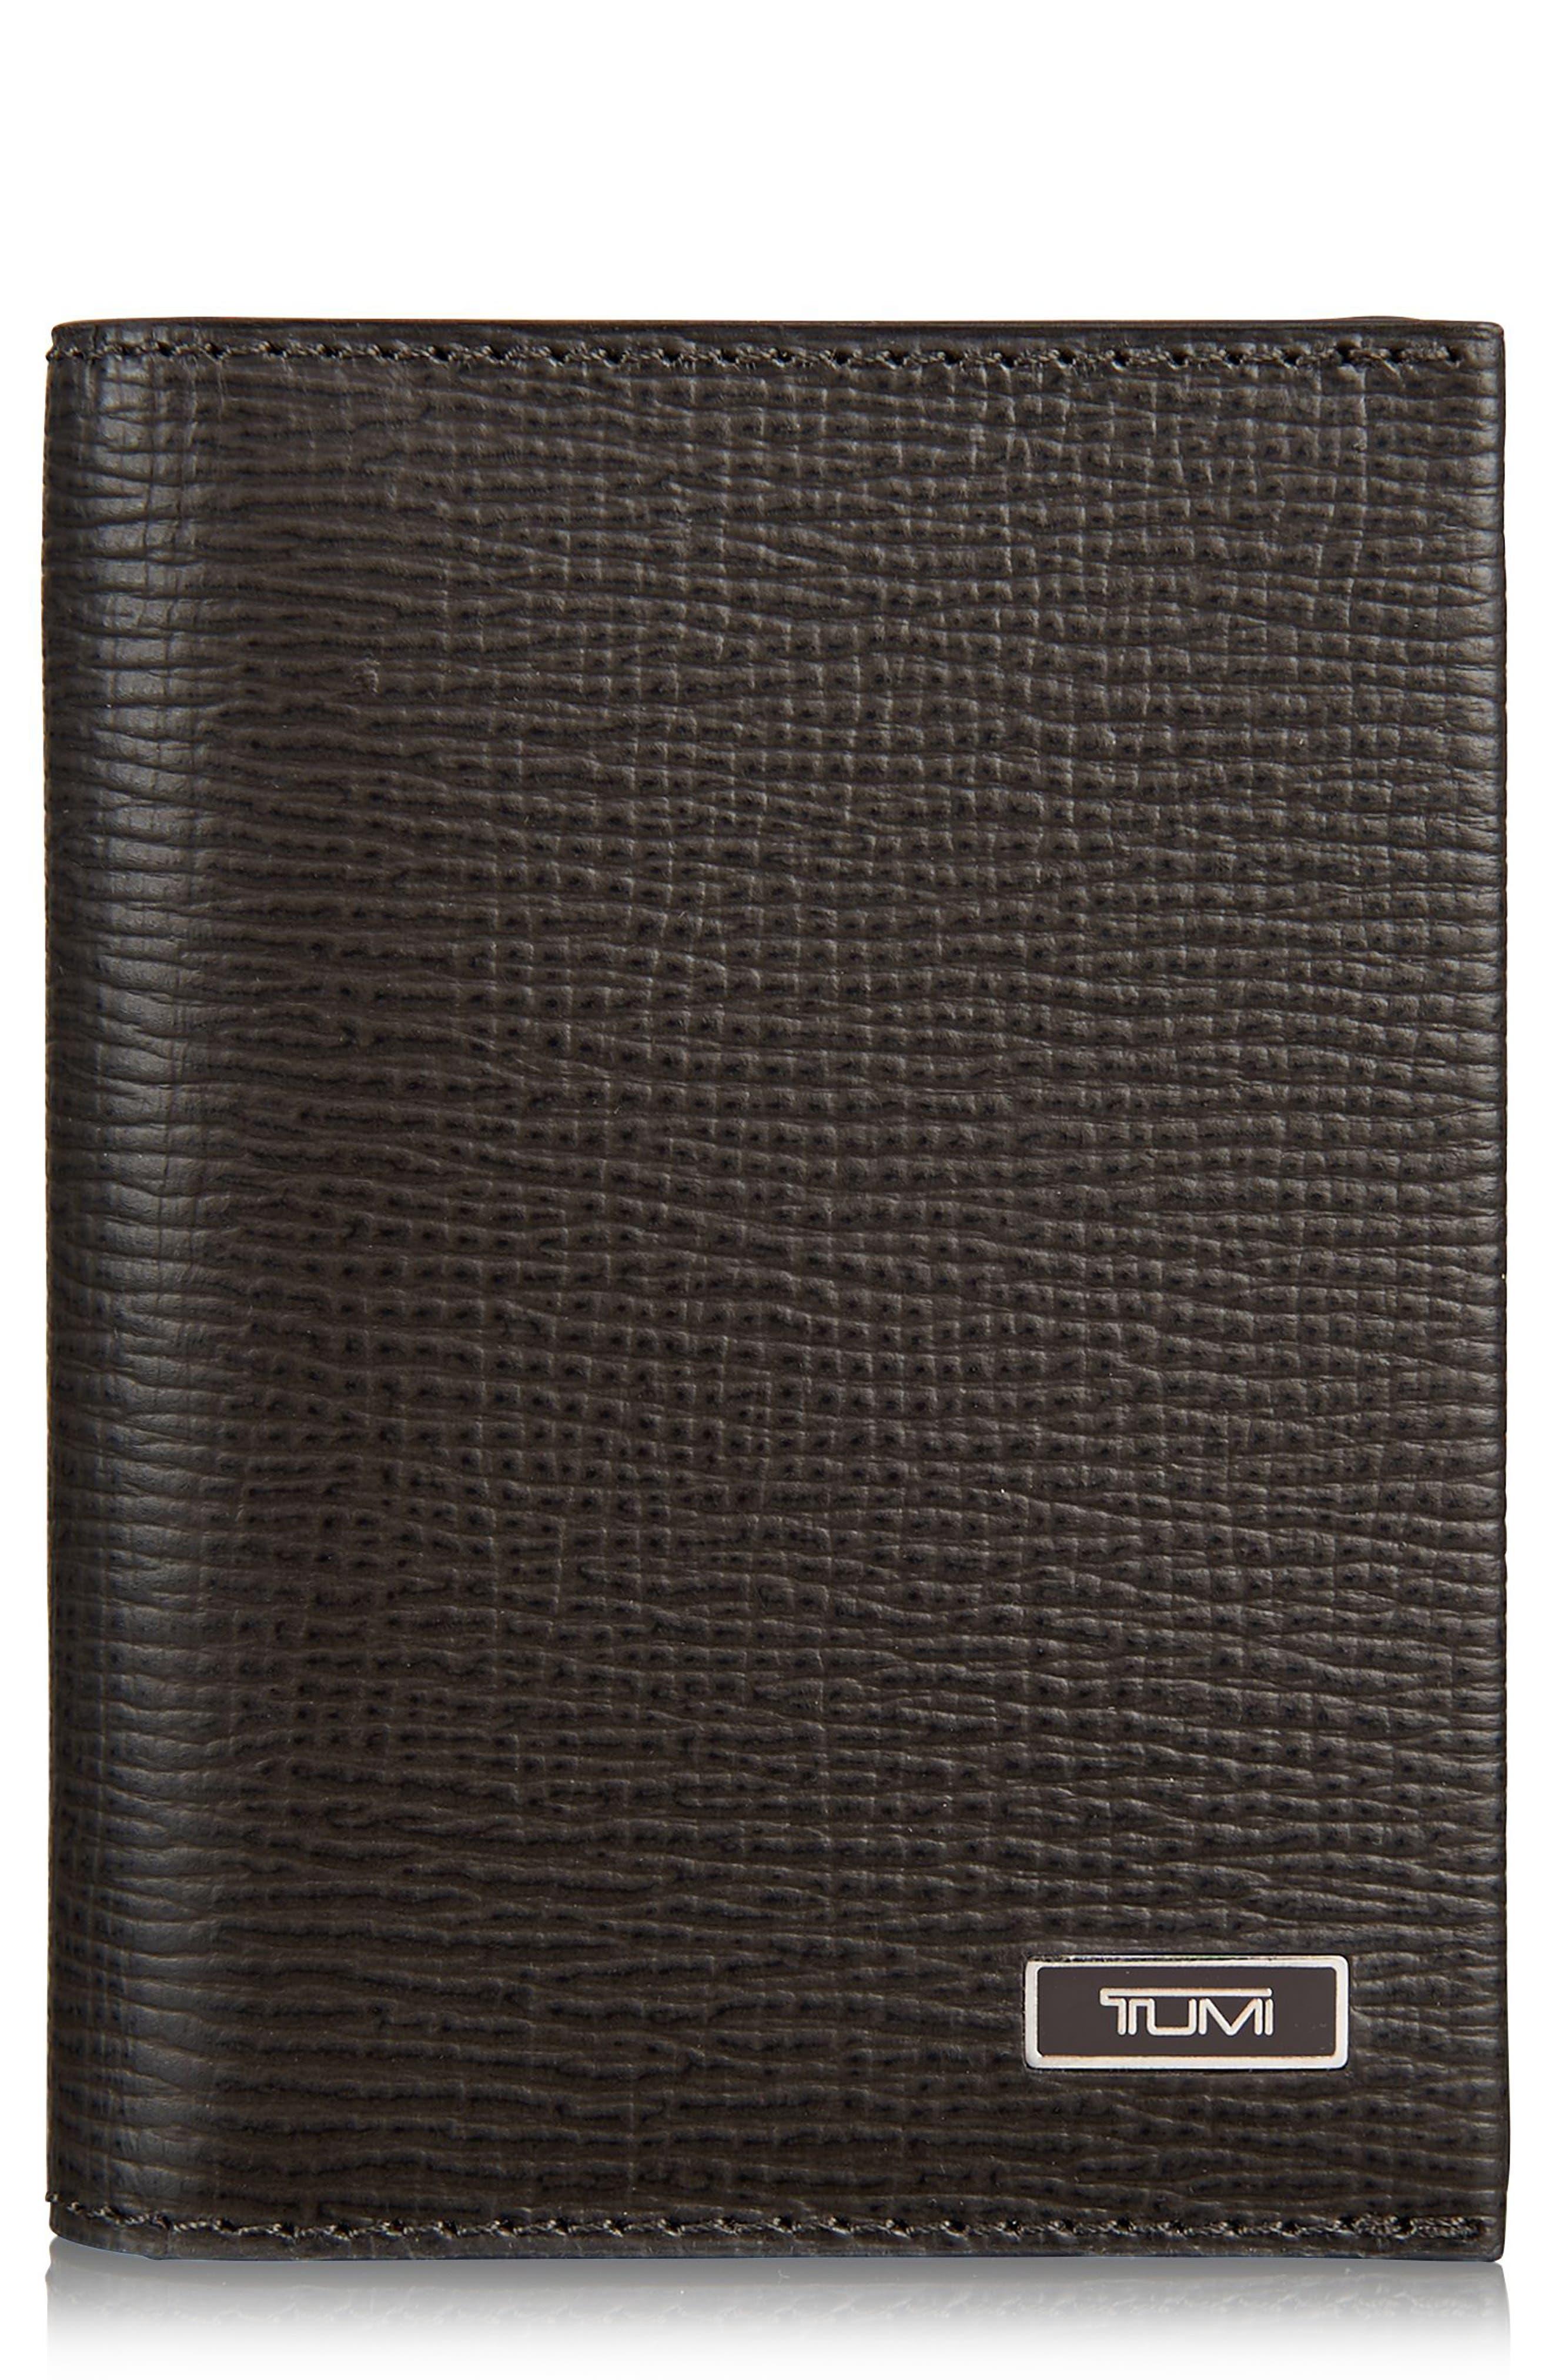 Monaco Leather Card Case,                             Main thumbnail 1, color,                             294